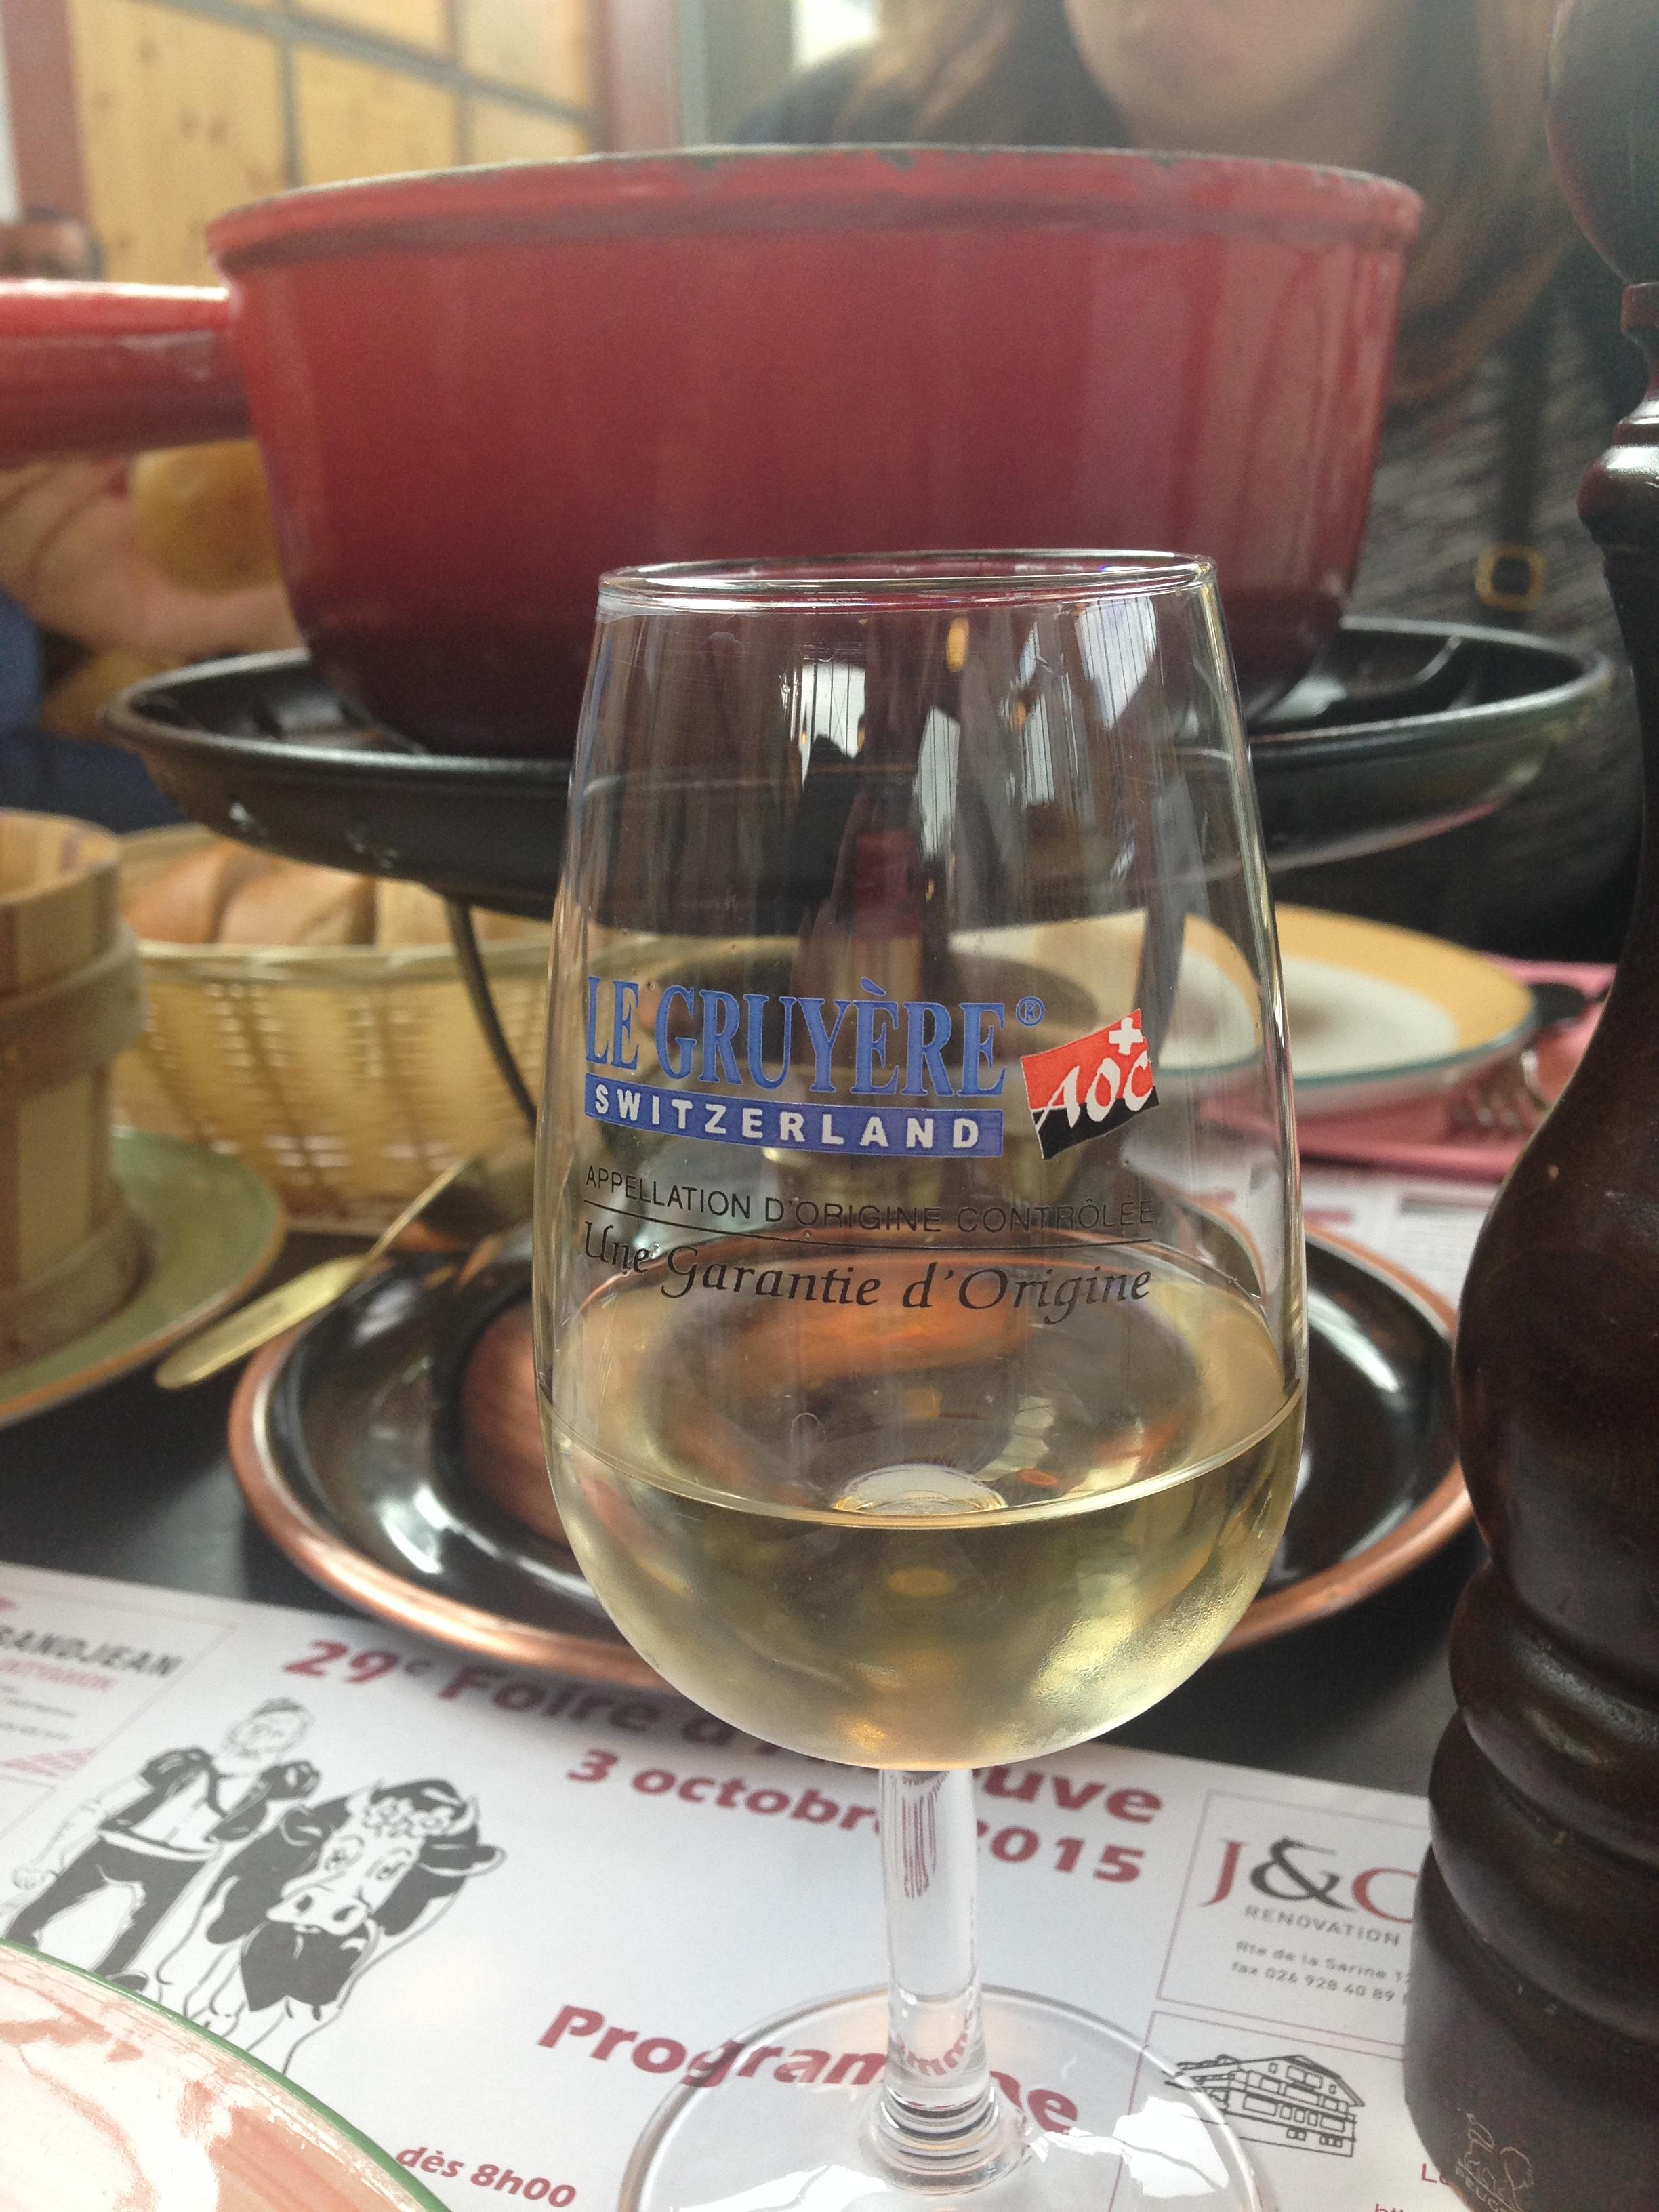 Fondu and wine